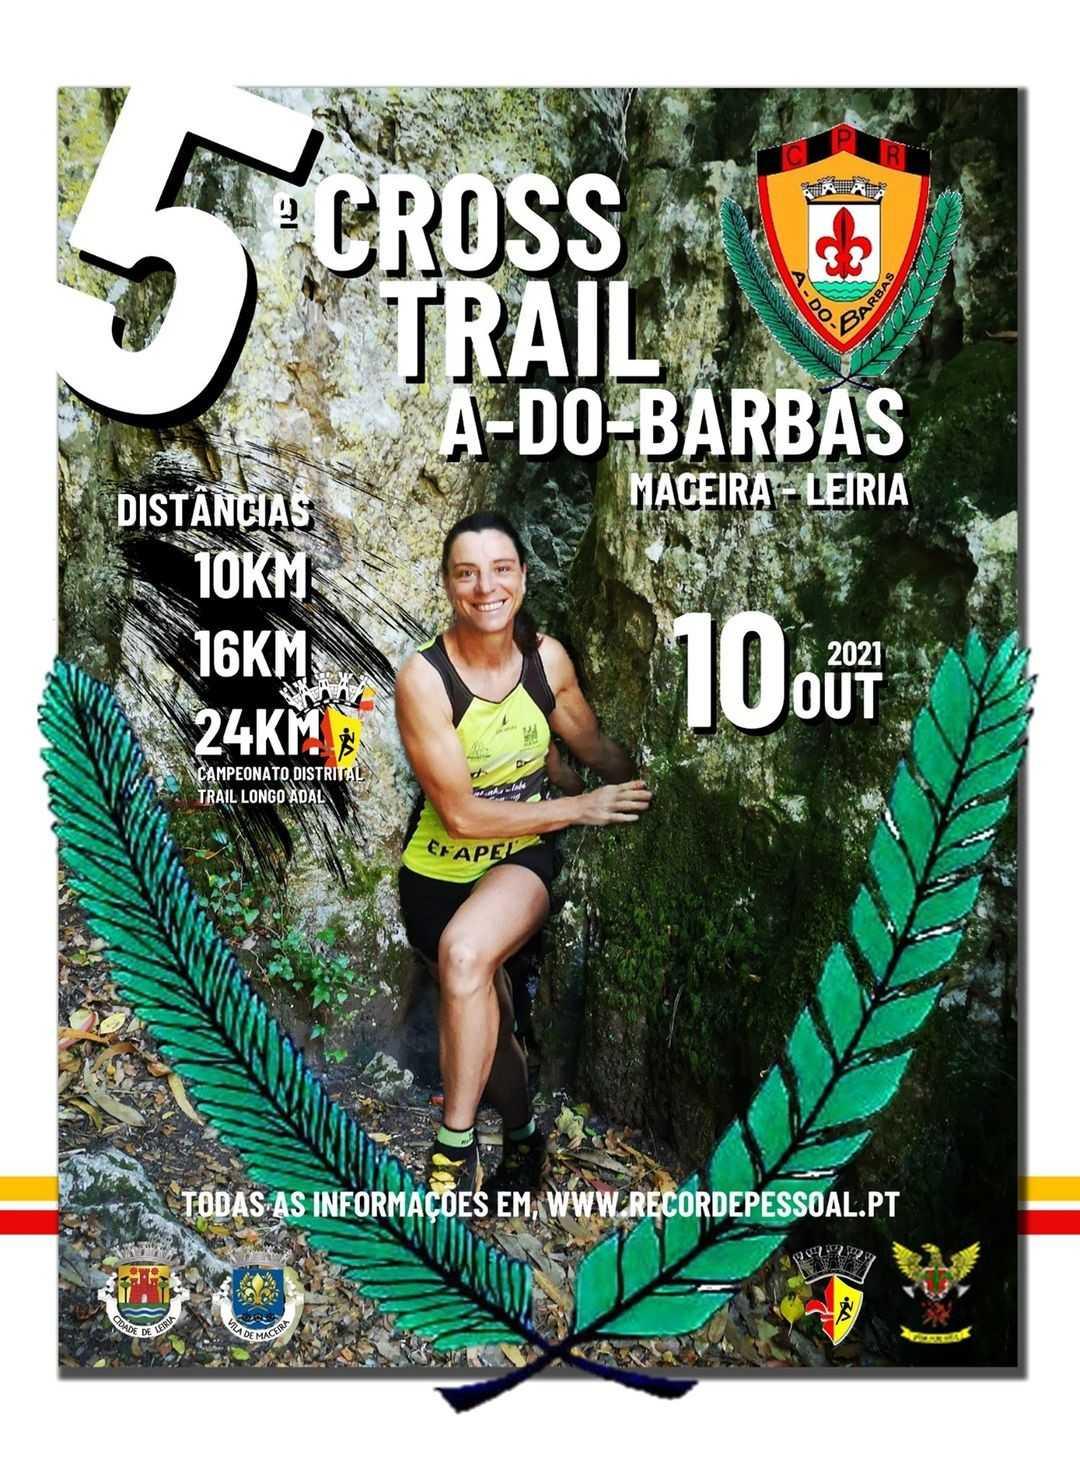 Cross/Trail CPR. A-do-Barbas 2021